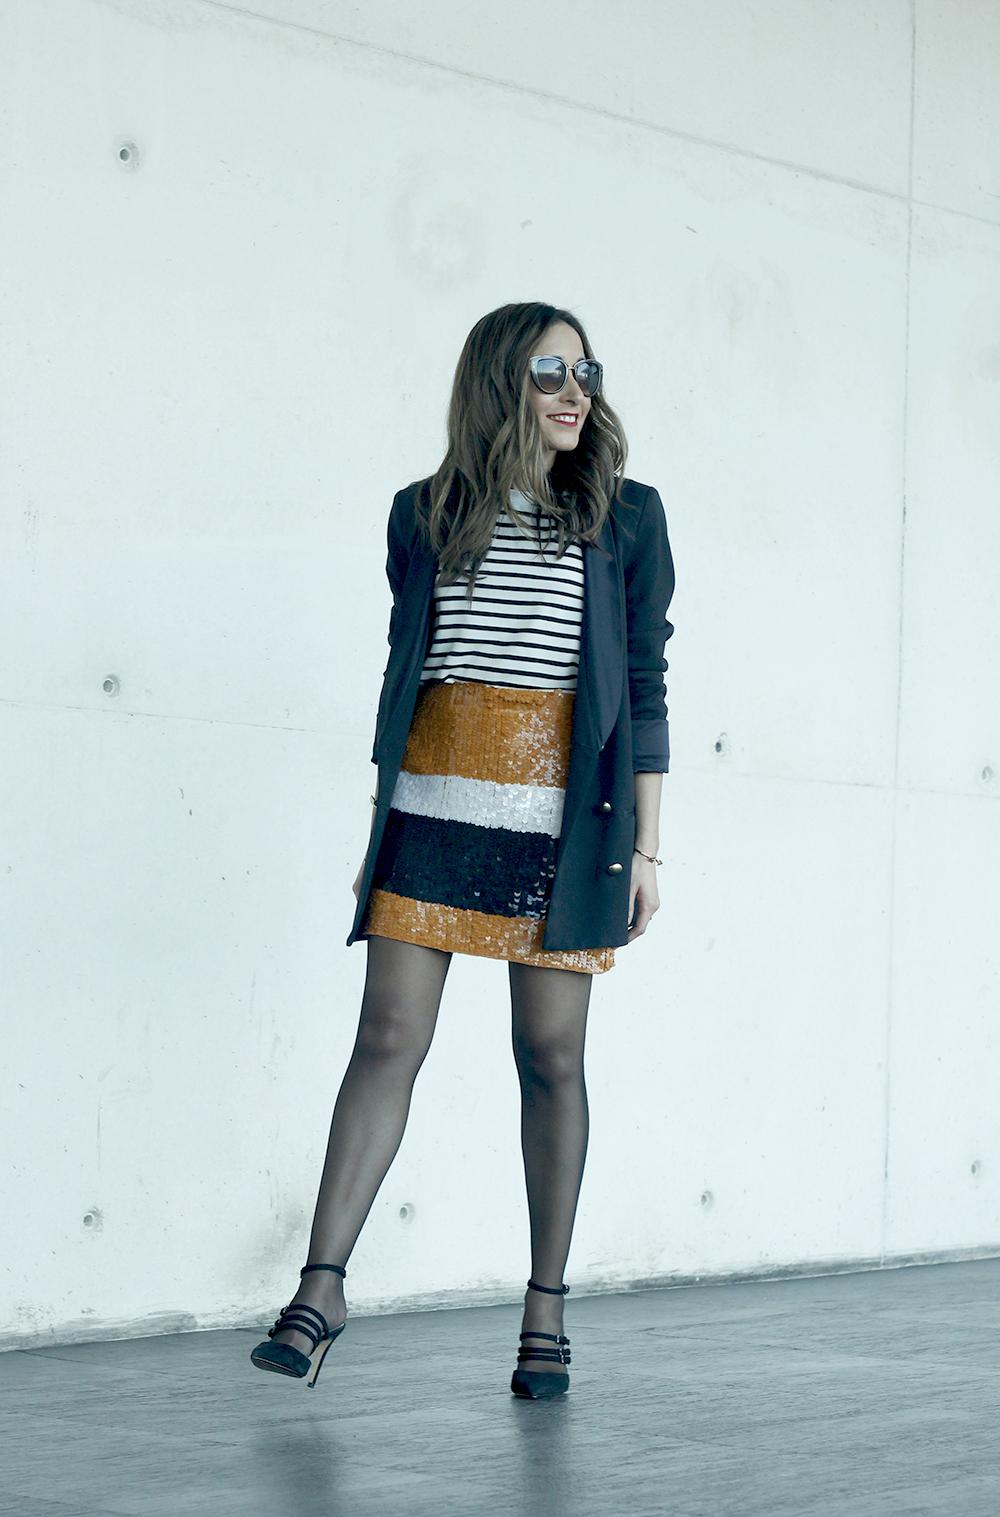 Striped T-Shirt Sequin skirt black blazer madrid fashion week street style fashion outfit04.jpg08